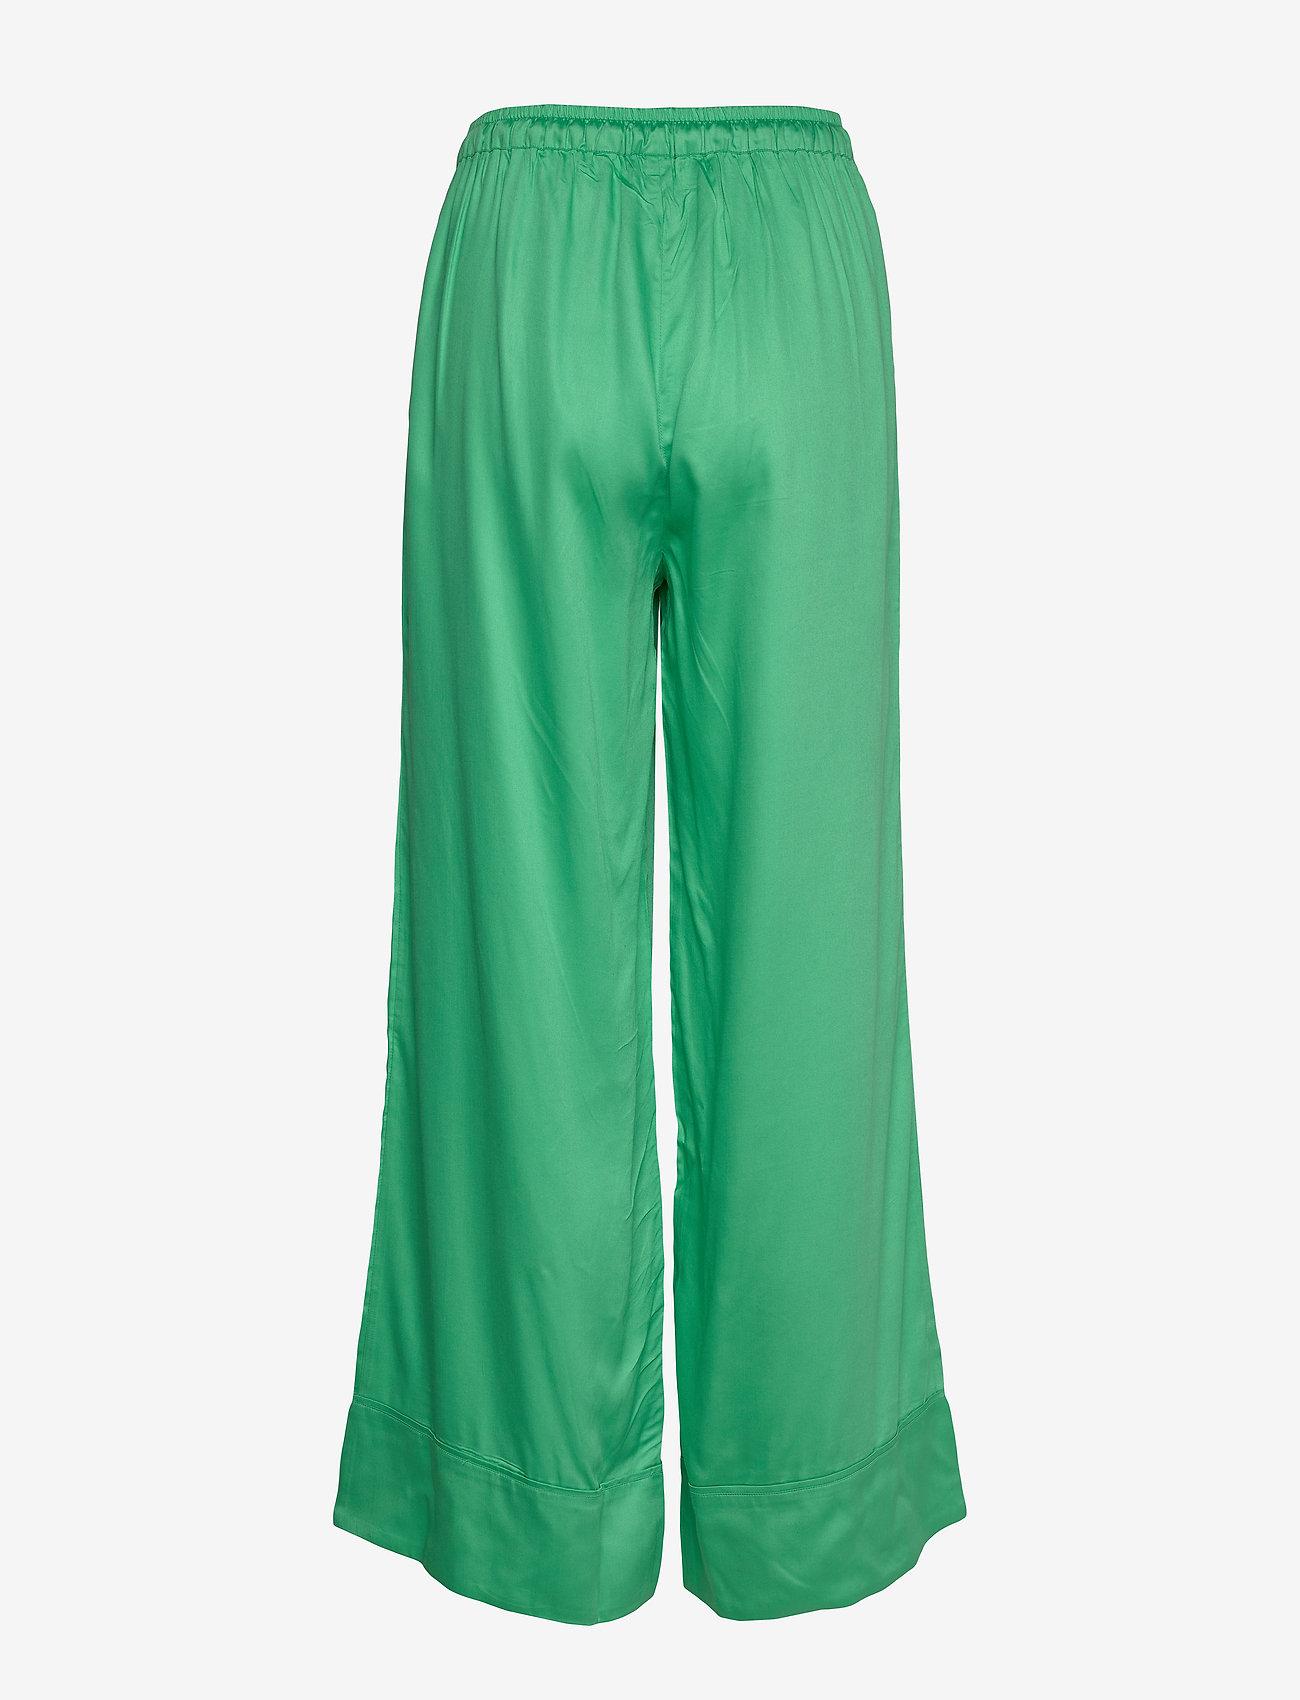 Underprotection - Rana pants - nederdelar - green - 1